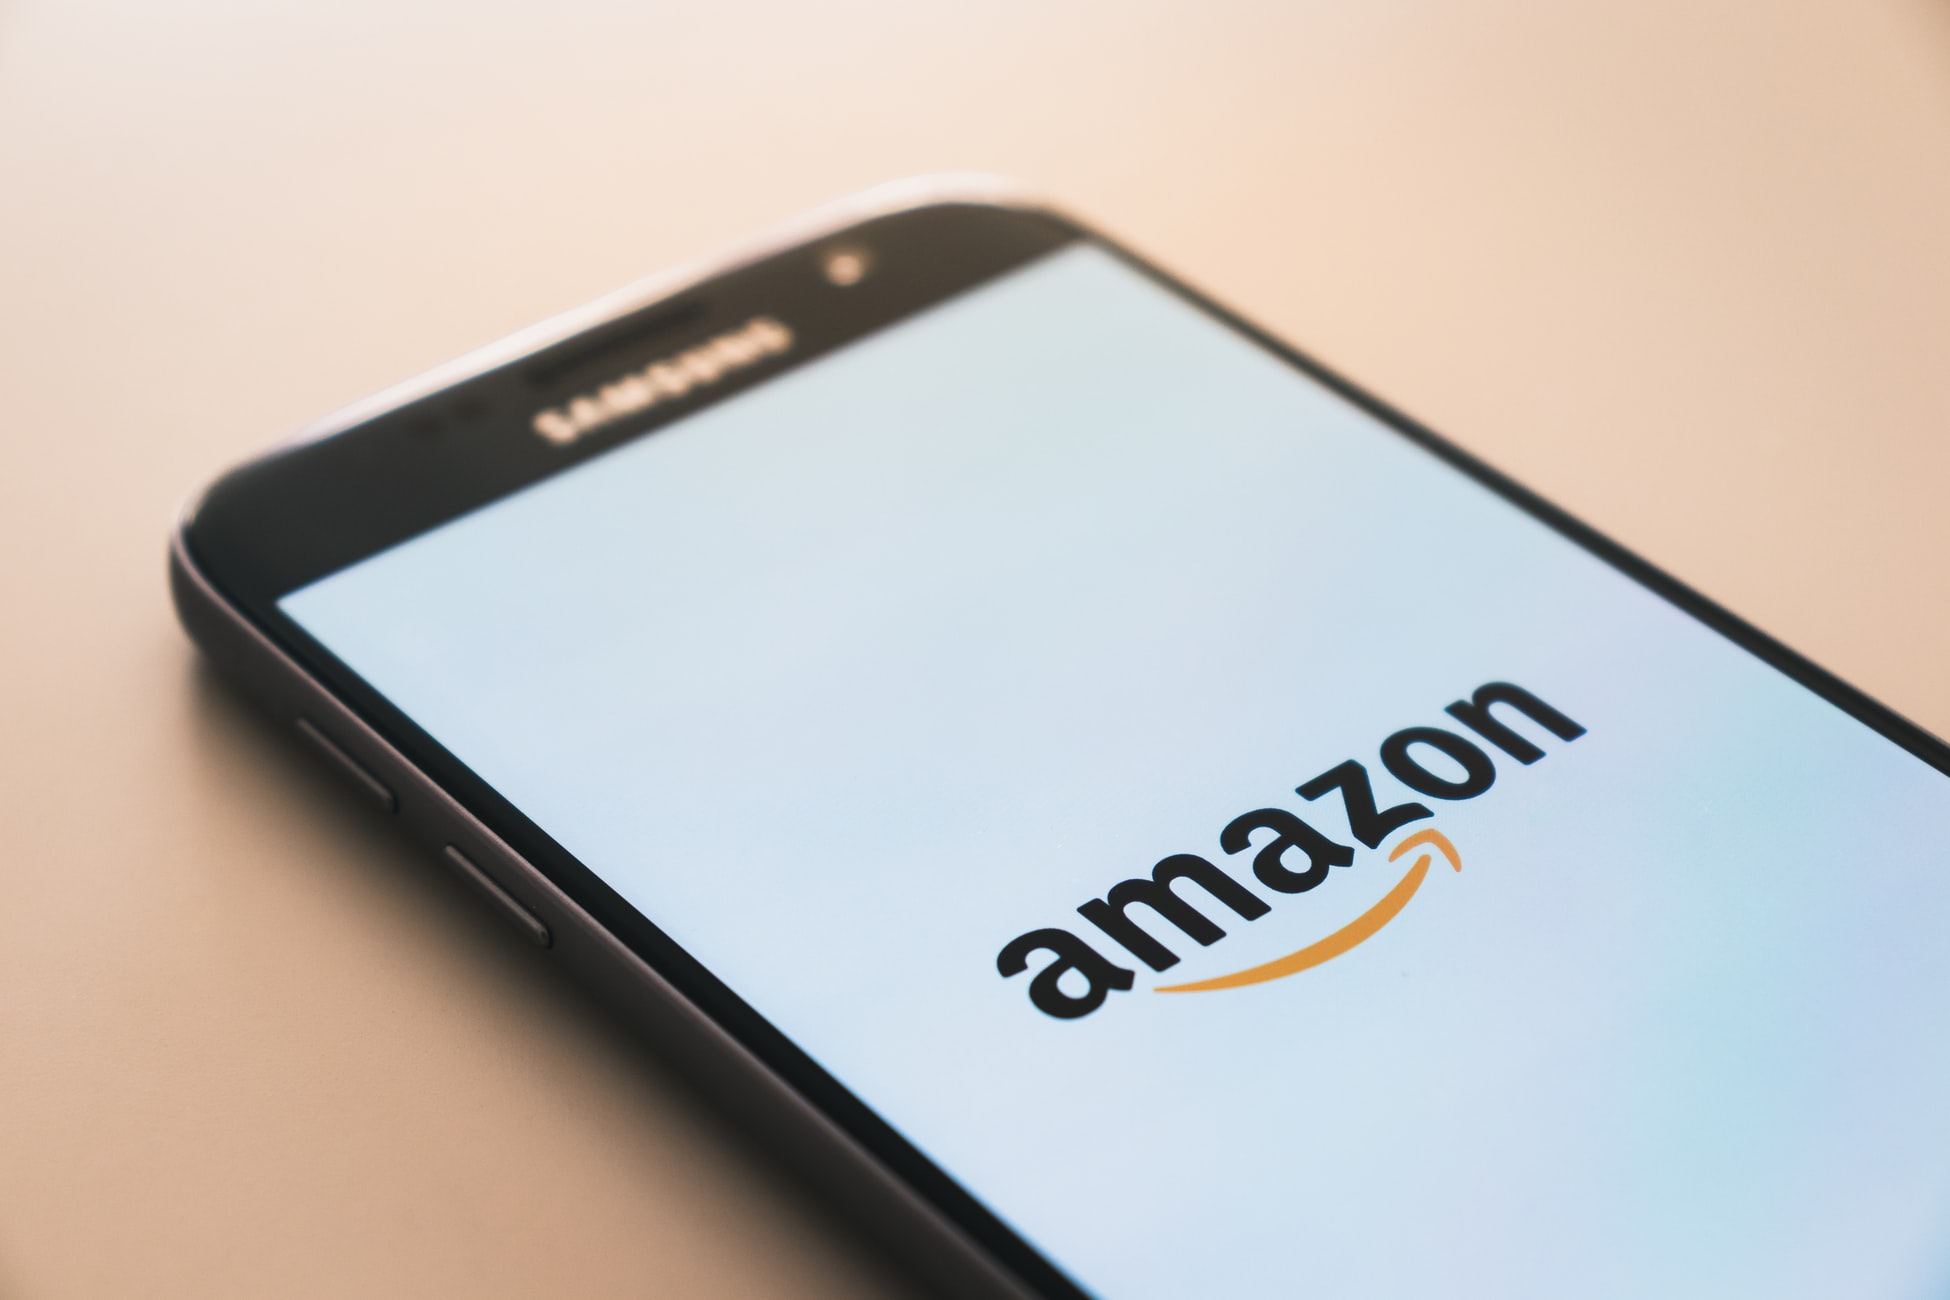 Amazon open on phone